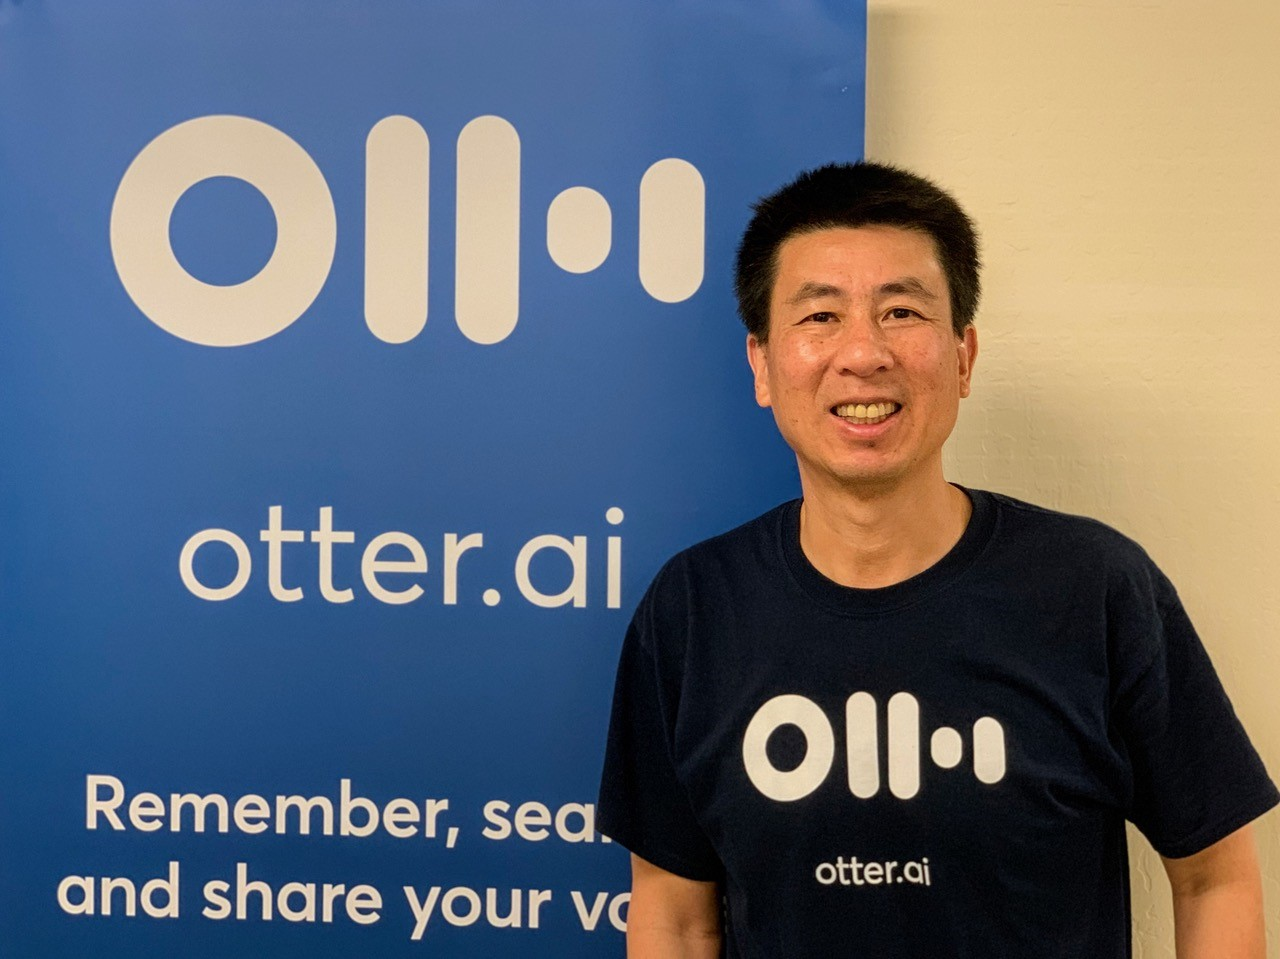 Sam Liang, CEO, Otter.ai